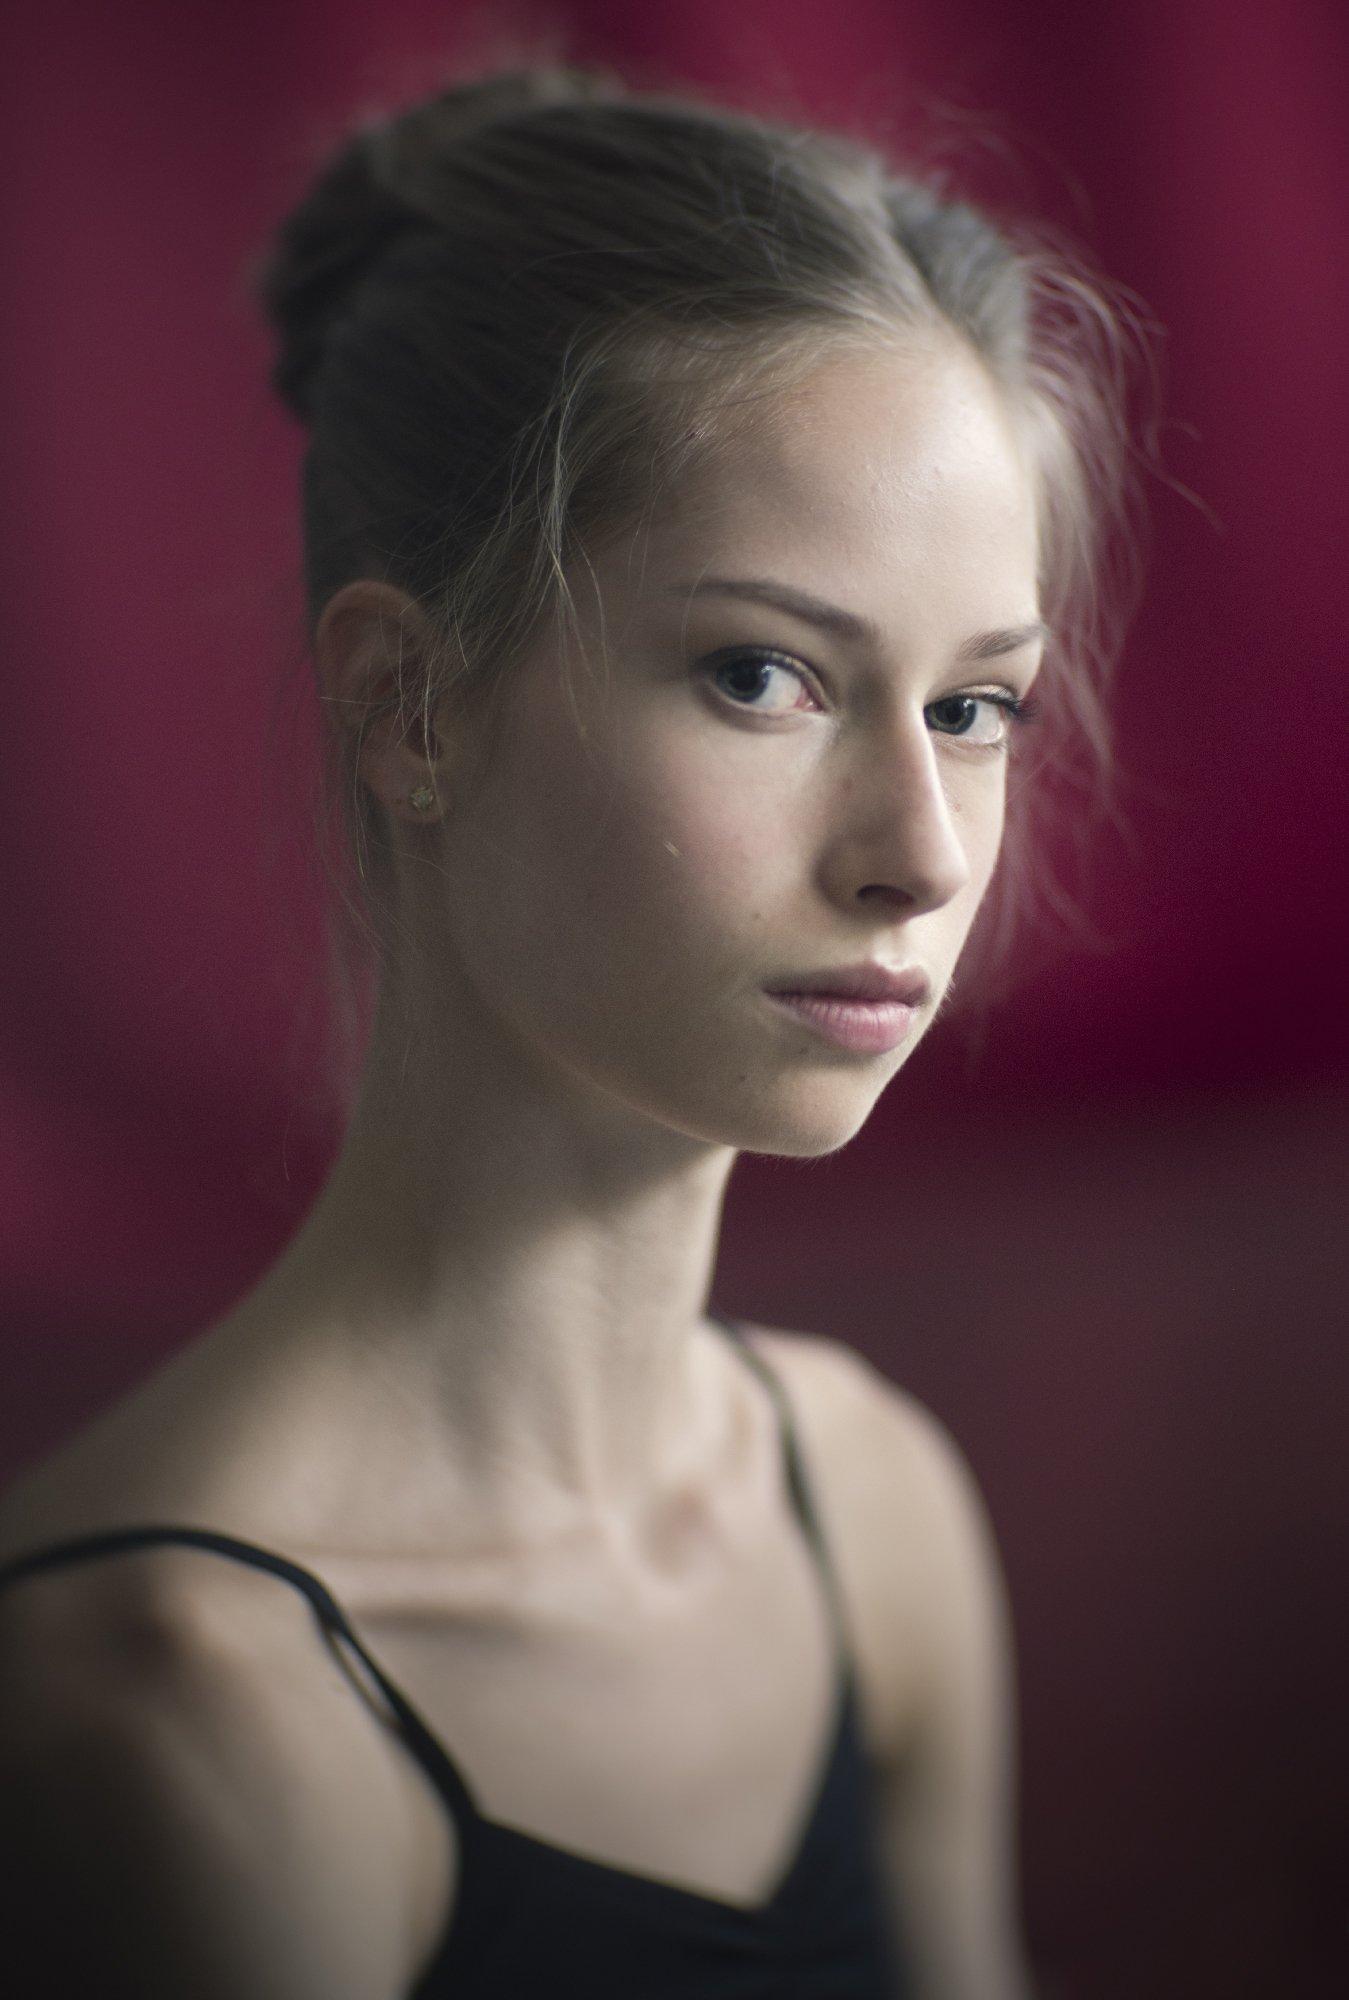 девушка, портрет, взгляд, ко-120м, valeko